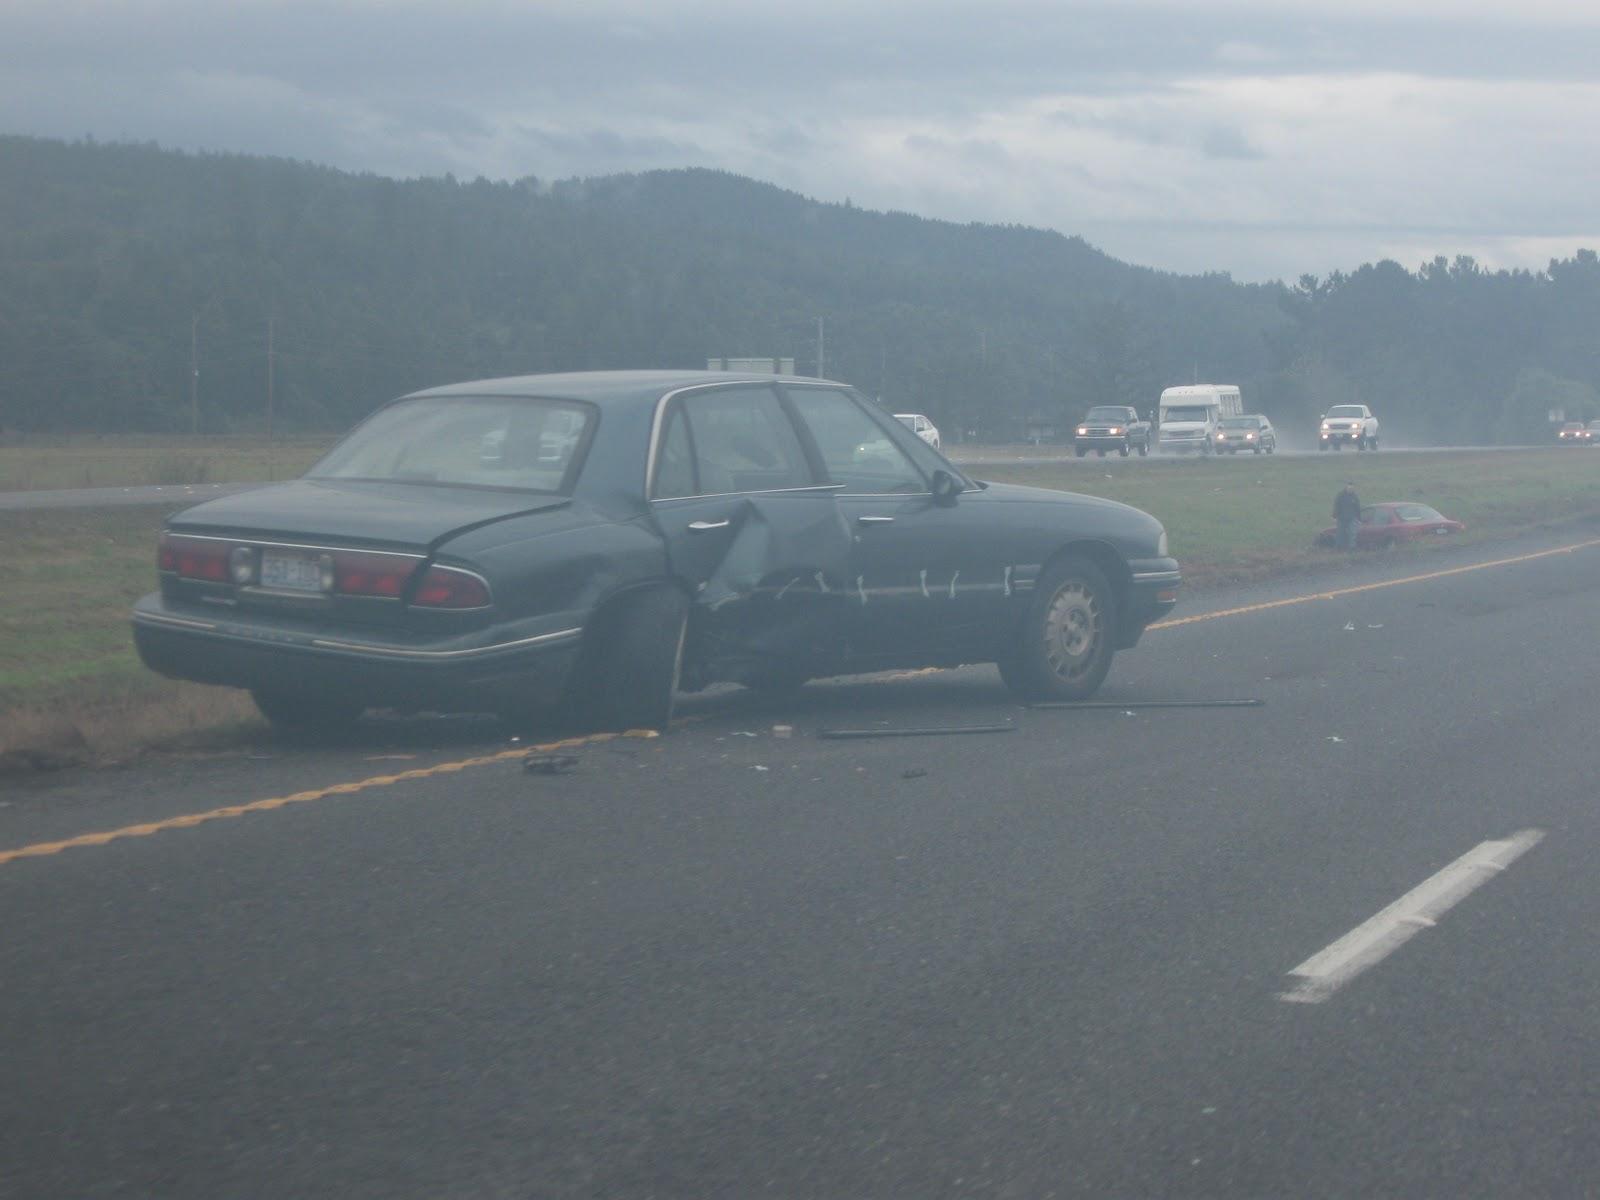 Tom Sebourn Blog: Rain Causes Traffic Accident On US 101